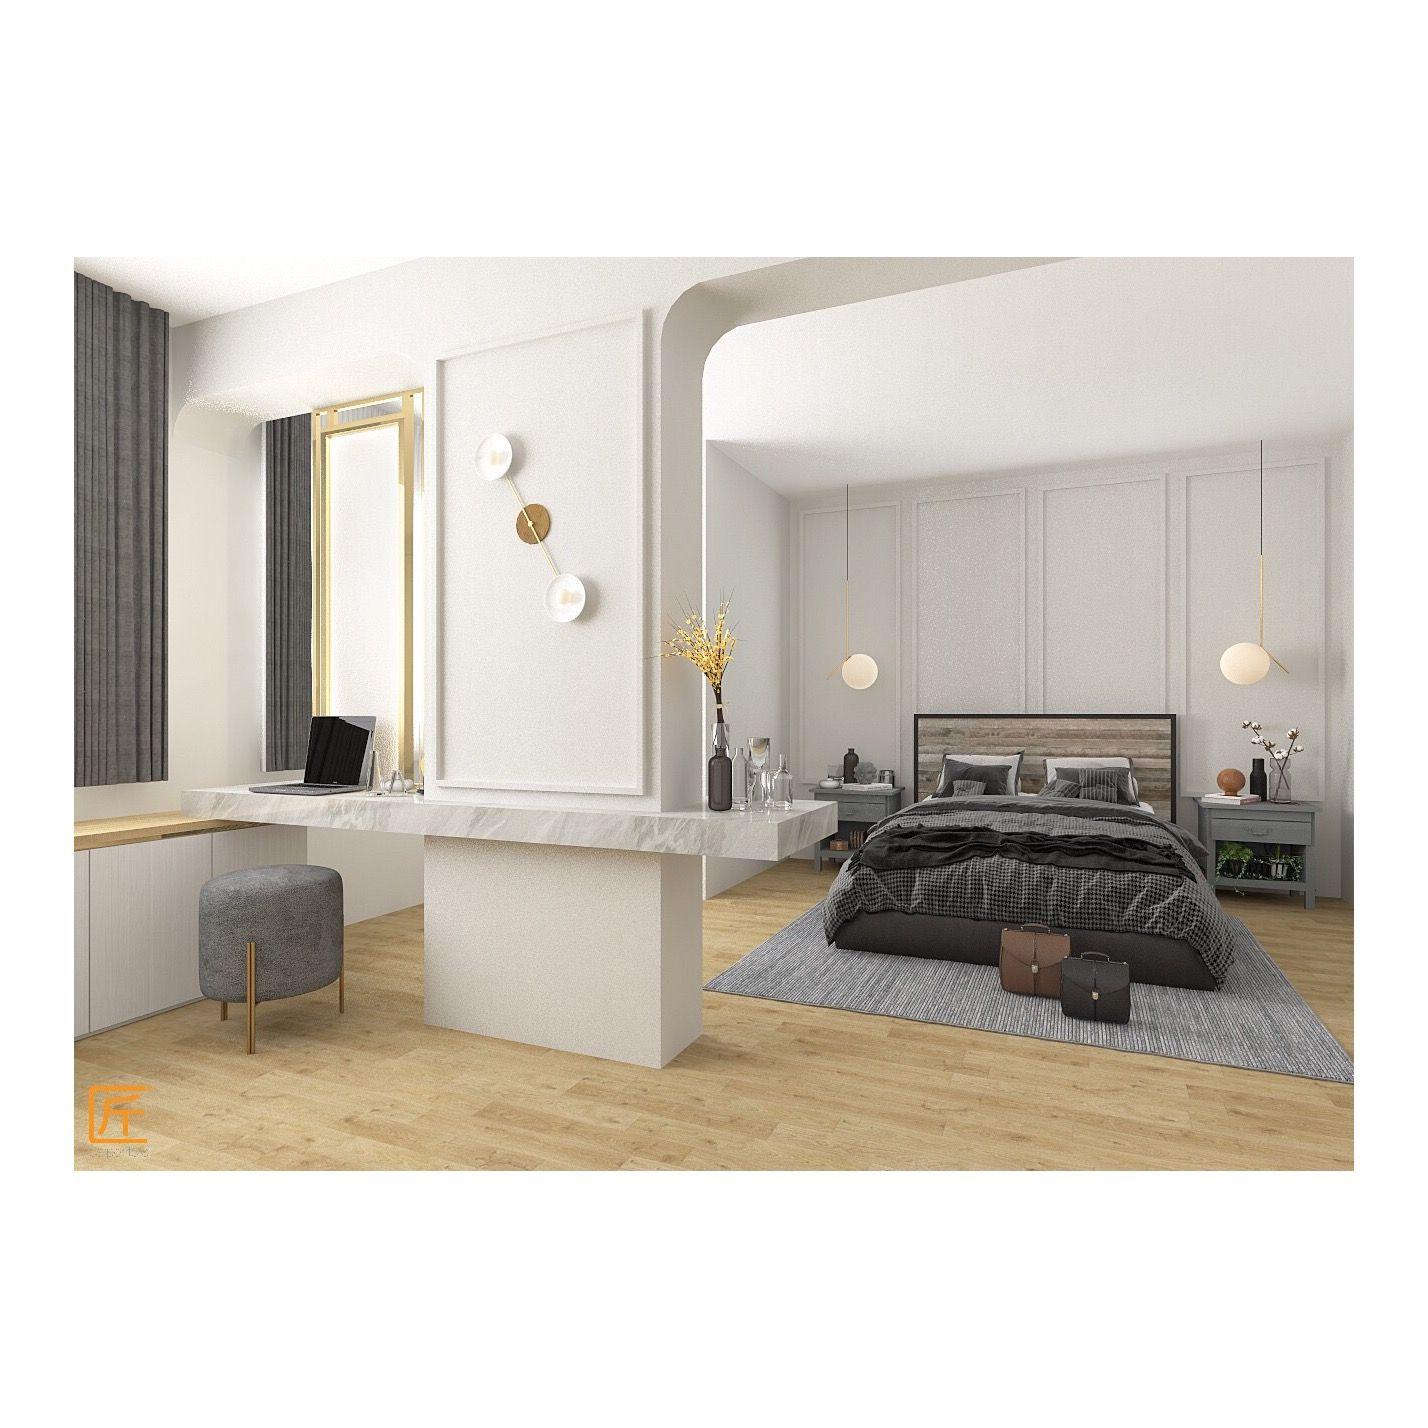 Home Design Ideas For Hdb Flats: Resale HDB Master Bedroom From Jaey Lim